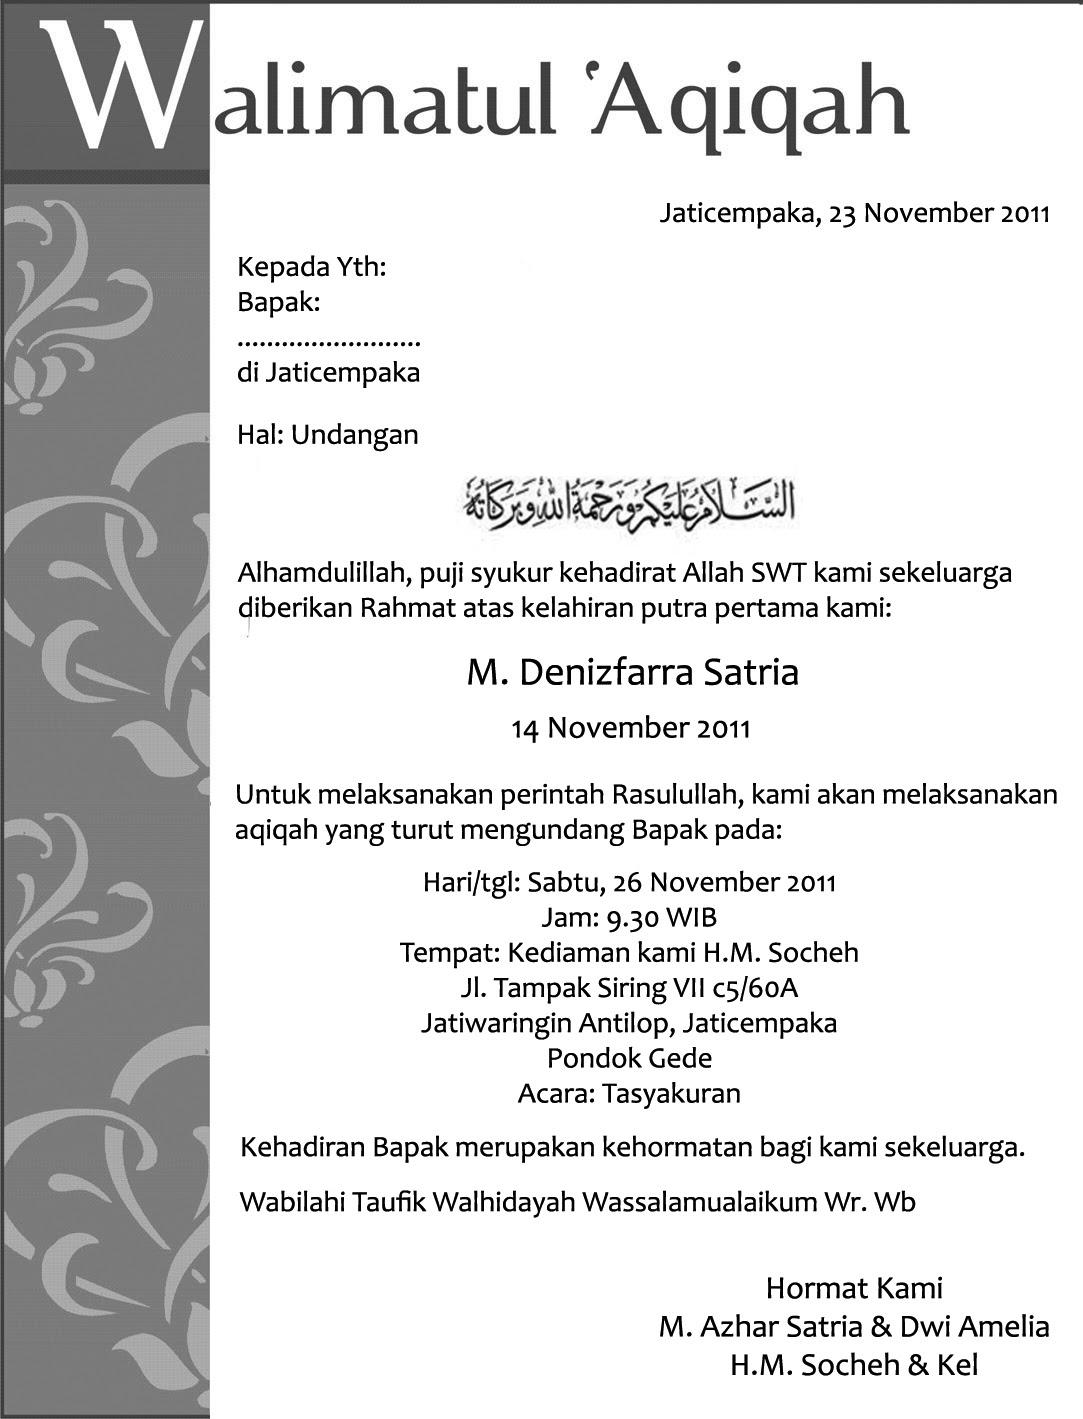 Contoh Undangan Tasyakuran Bahasa Jawa